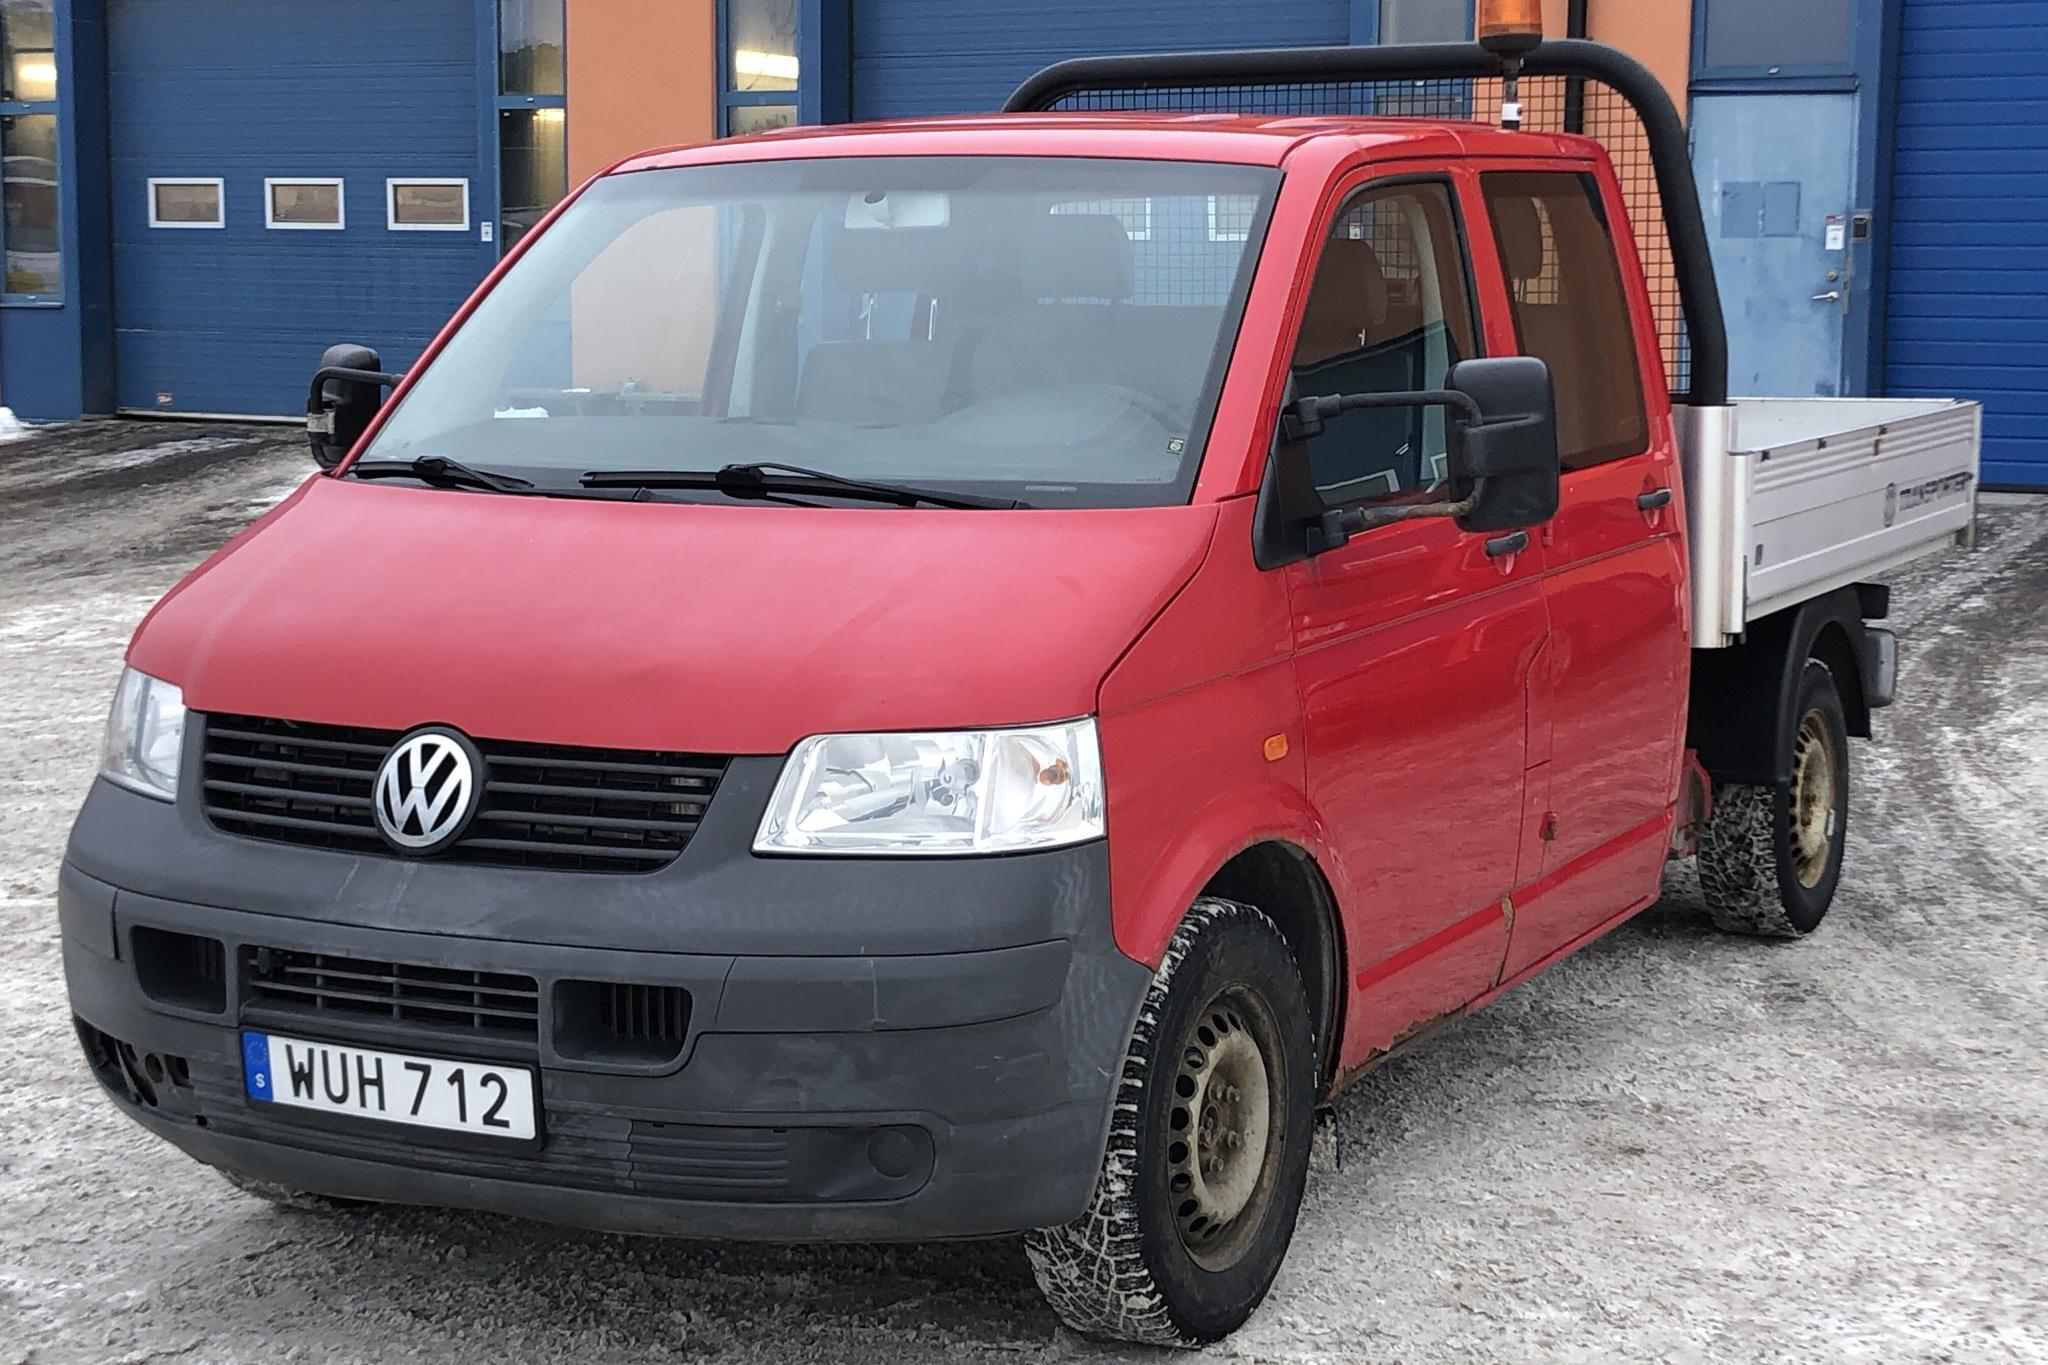 VW Transporter T5 2.5 TDI Pickup (130hk) - 150 990 km - Automatic - 2005